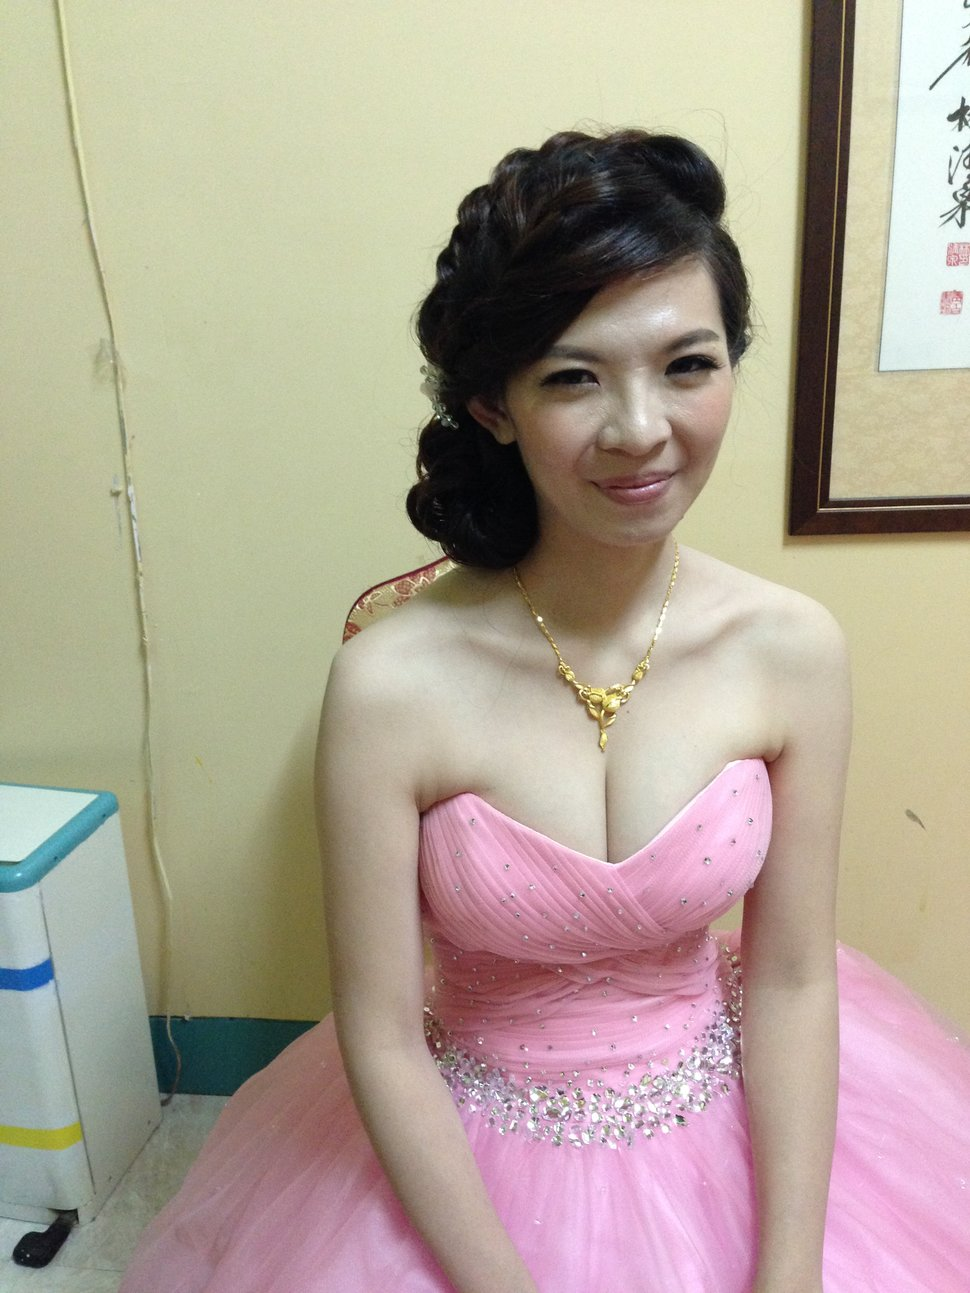 【SUN Studio新娘秘書】婚宴造型-麗雲(編號:428157) - SUN Studio-珊珊 新娘秘書 - 結婚吧